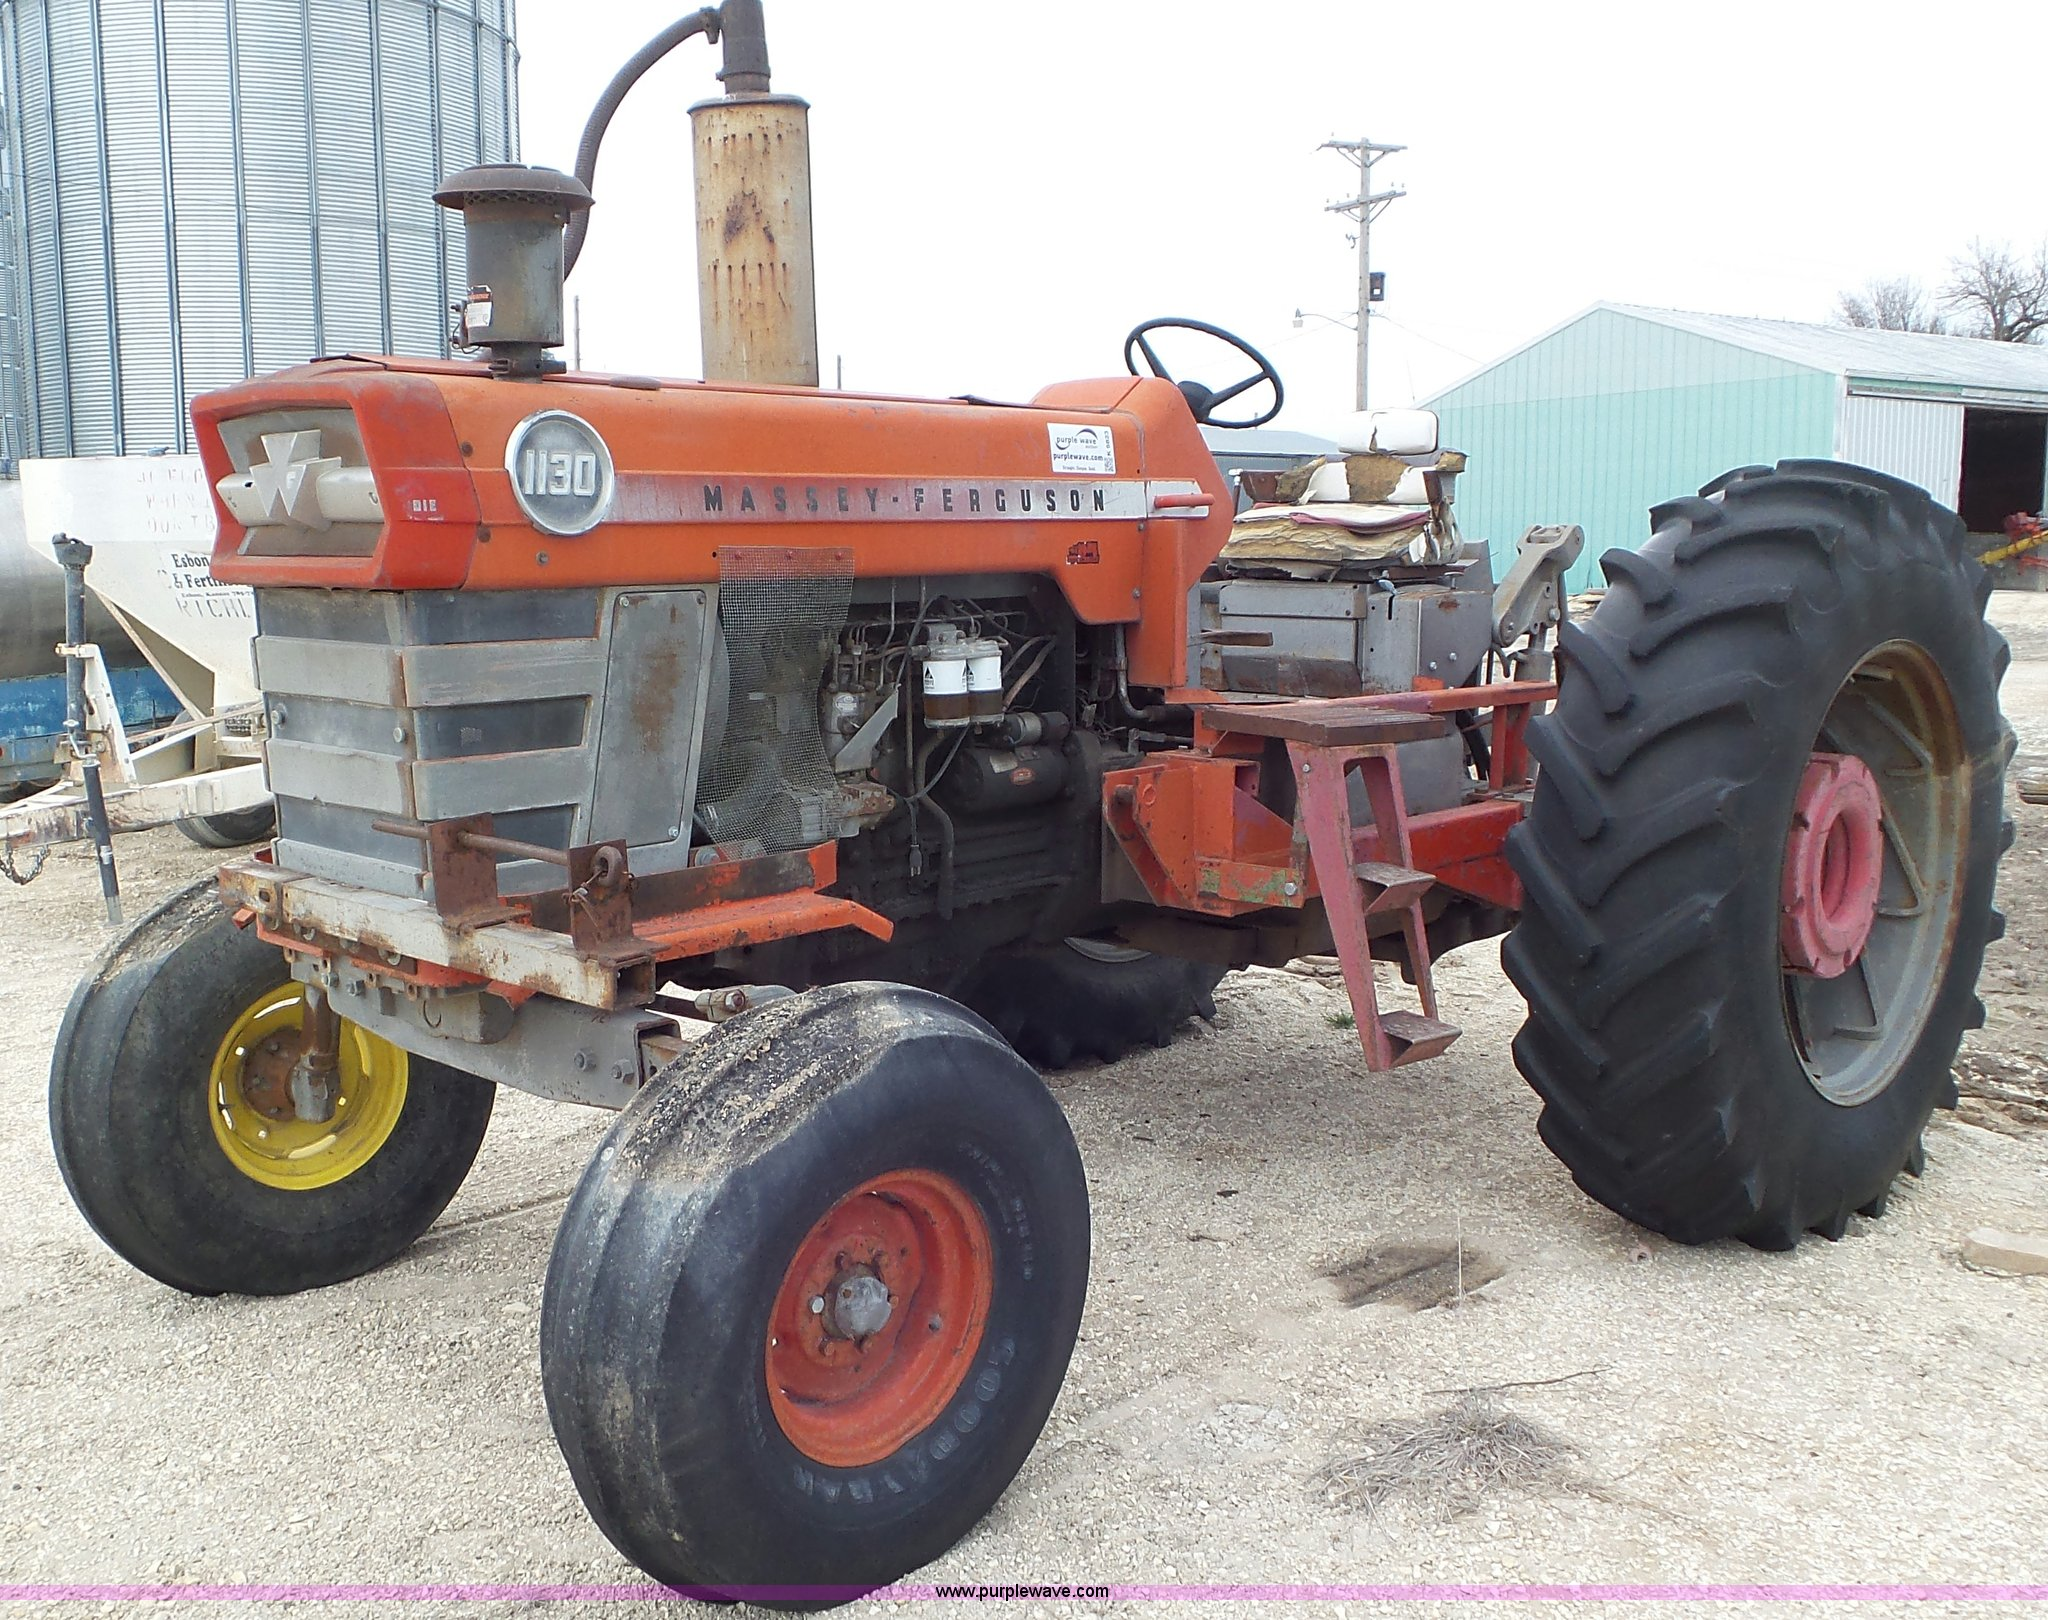 Massey-Ferguson 1130 tractor | Item K6823 | SOLD! April 27 A